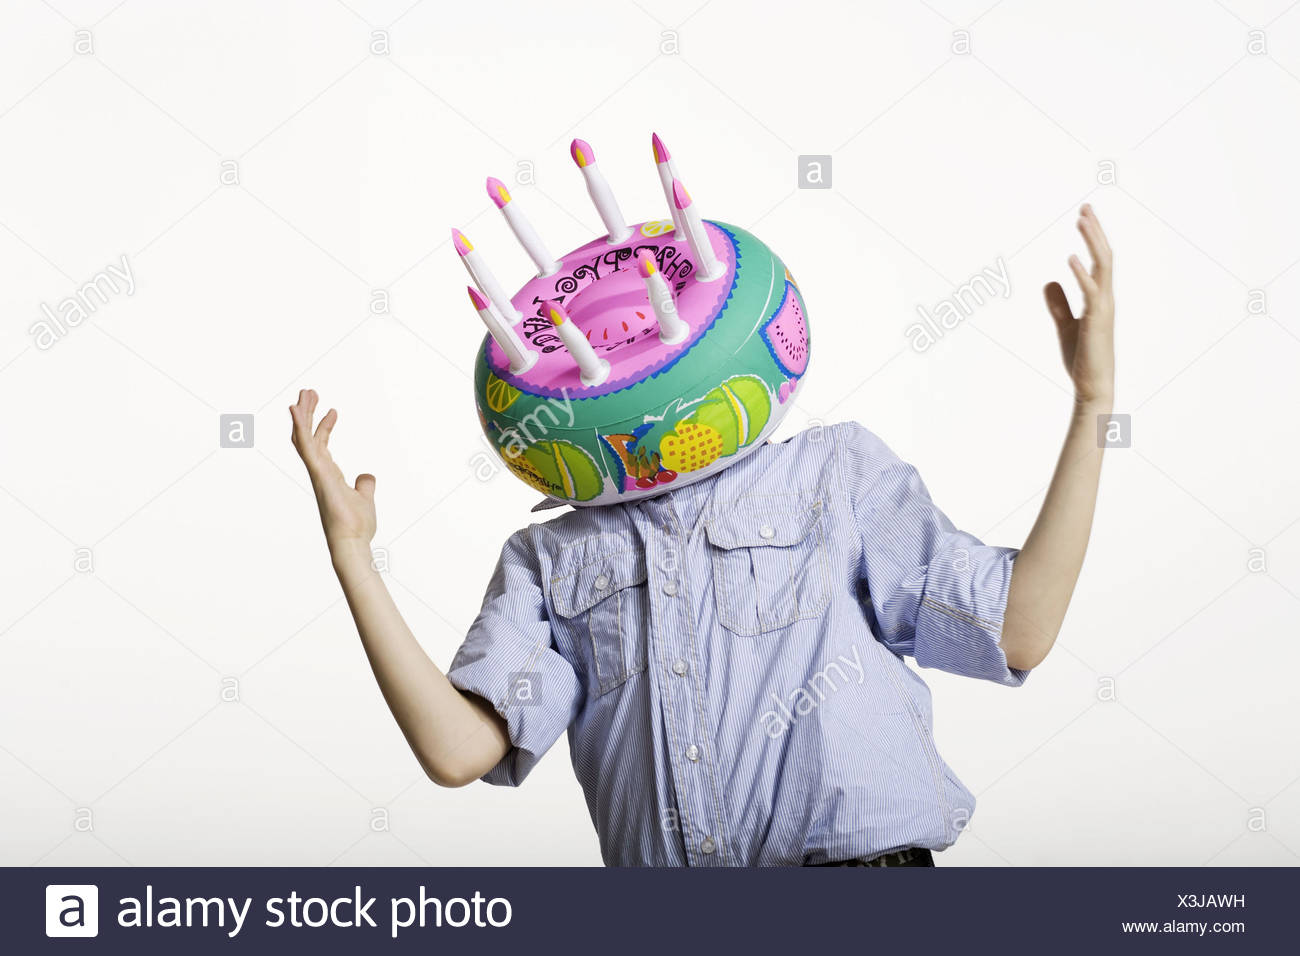 Stehend Geste Kopf Geburtstagstorte Aufblasbare Semi Portrait